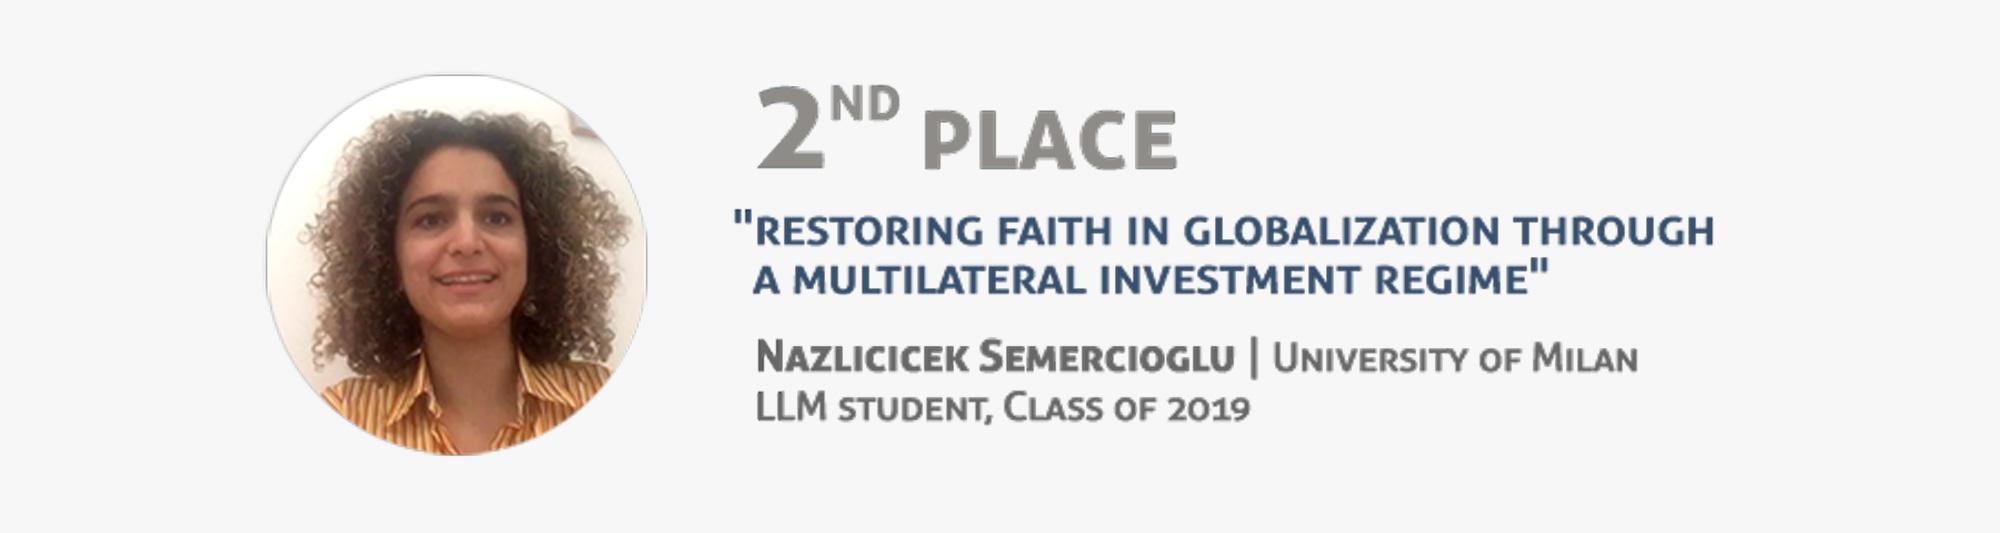 Second place - Nazlicicek Semercioglu - University of Milan